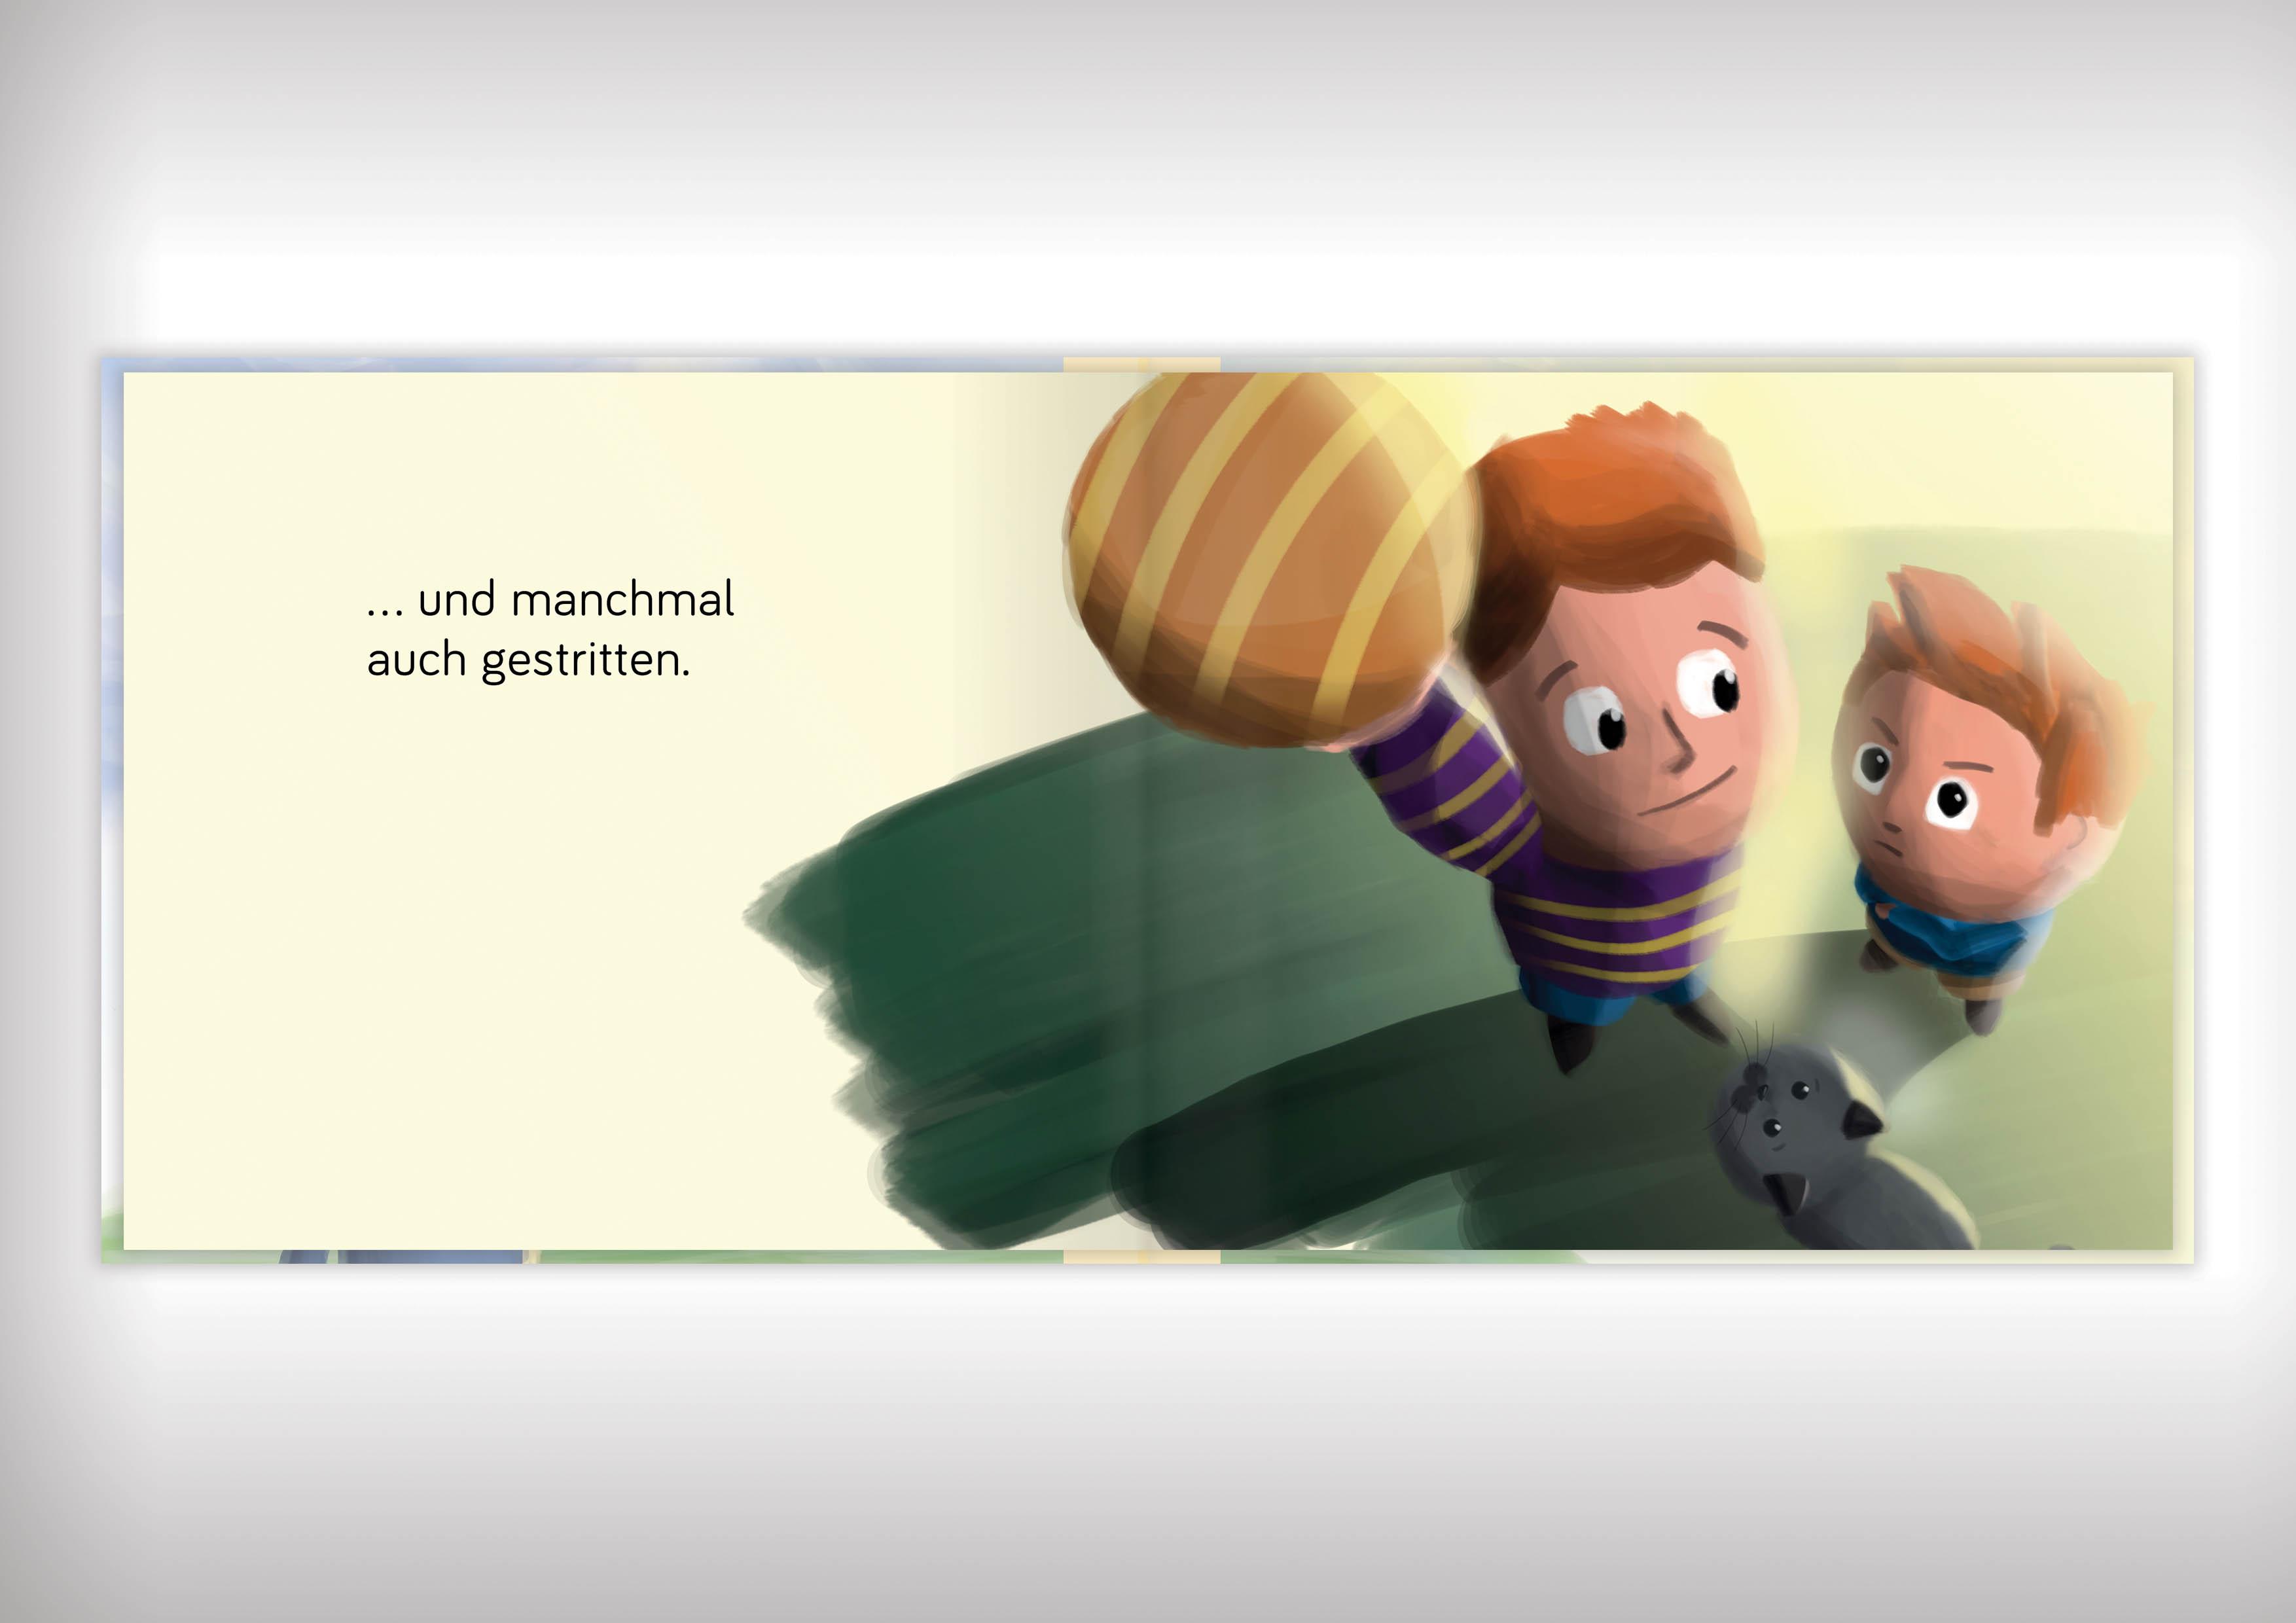 Kinderbuch_Mockup_01 MERGED_0027_Seite_08